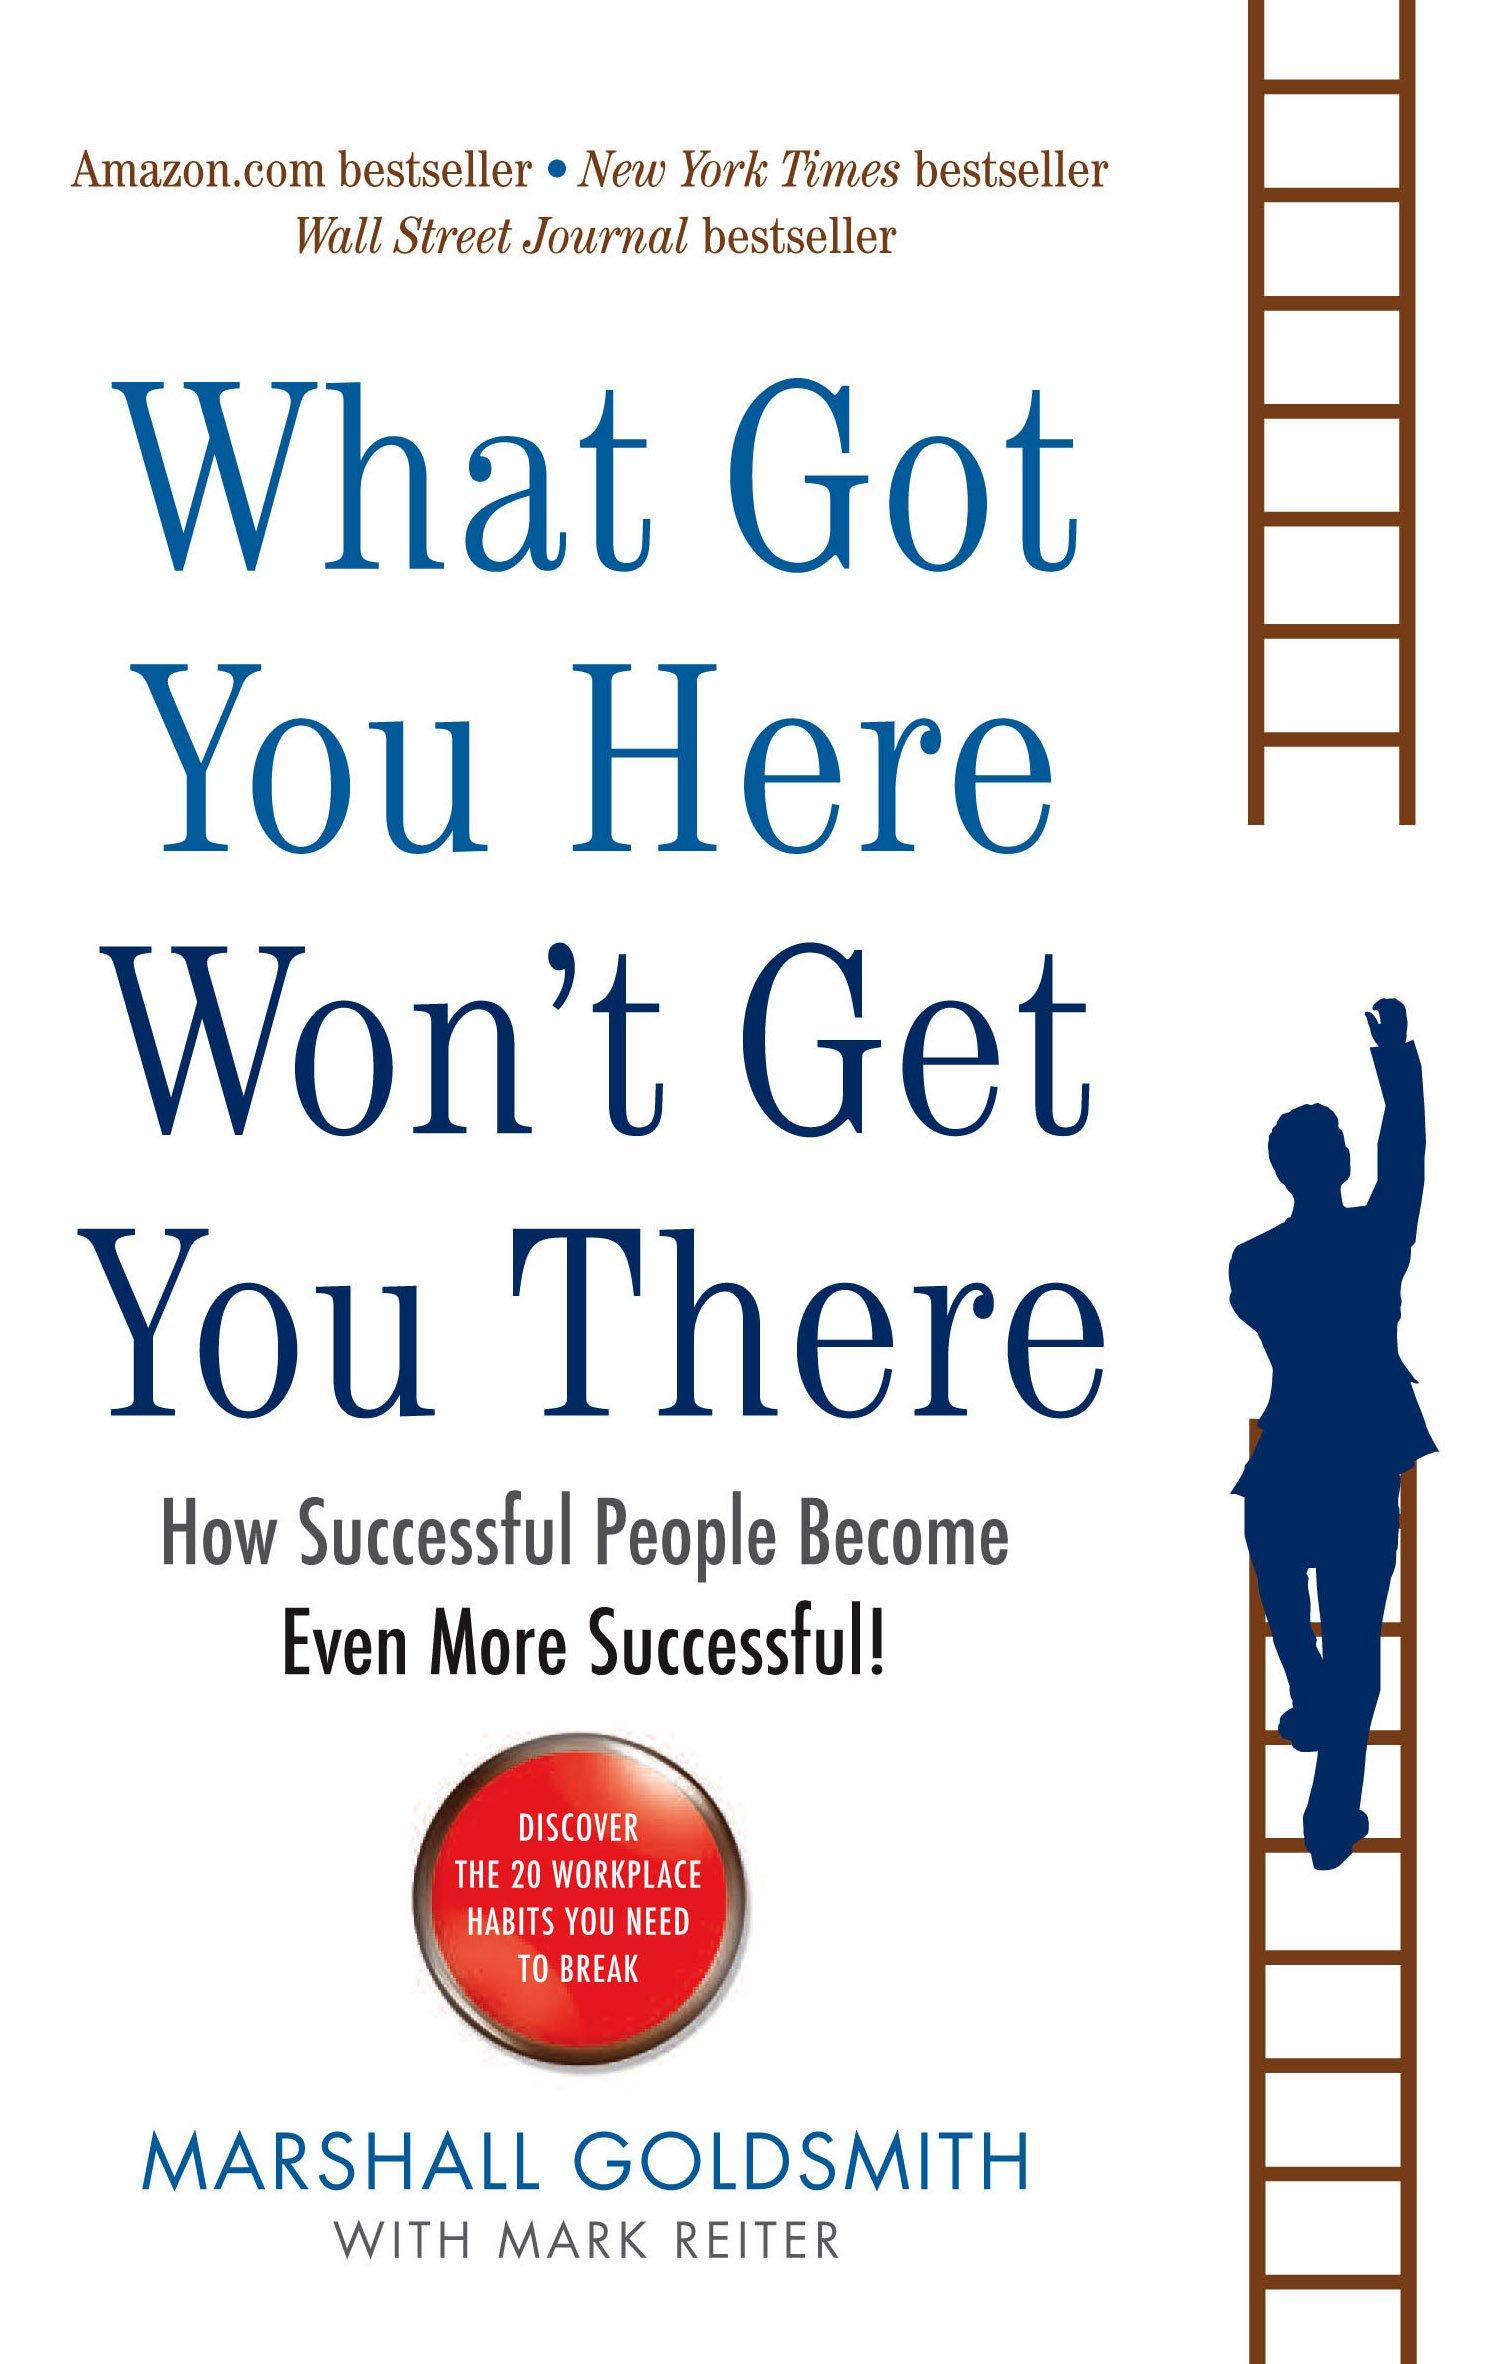 Profile of Success with Jordan Goldrich